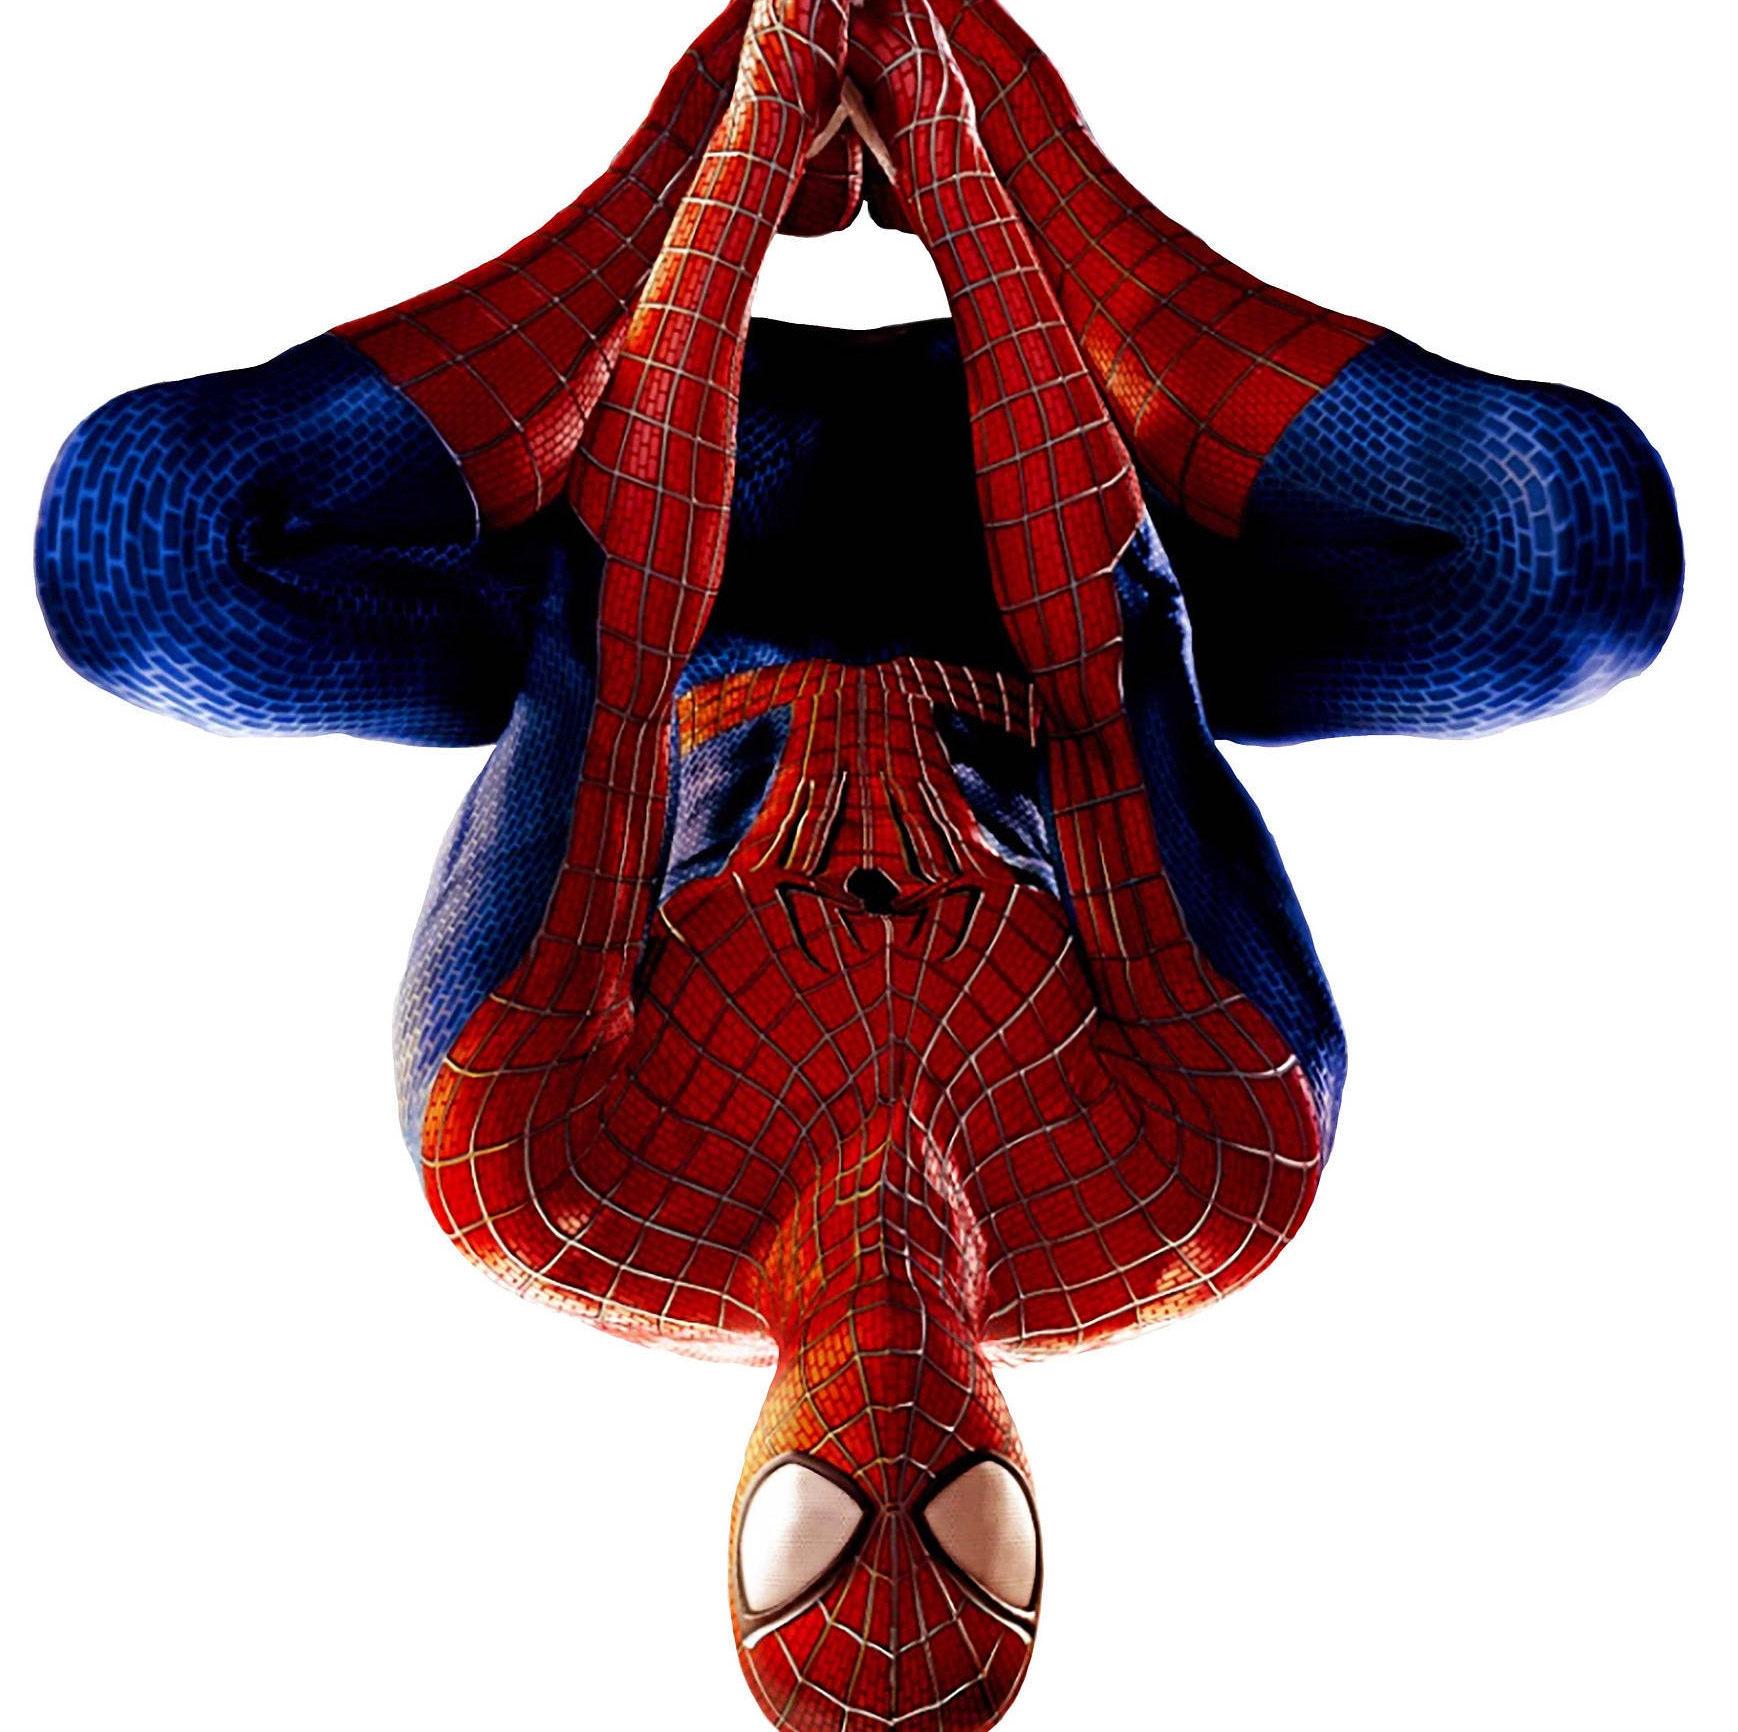 spiderman decal spiderman sticker vinyl wall decal wall 1